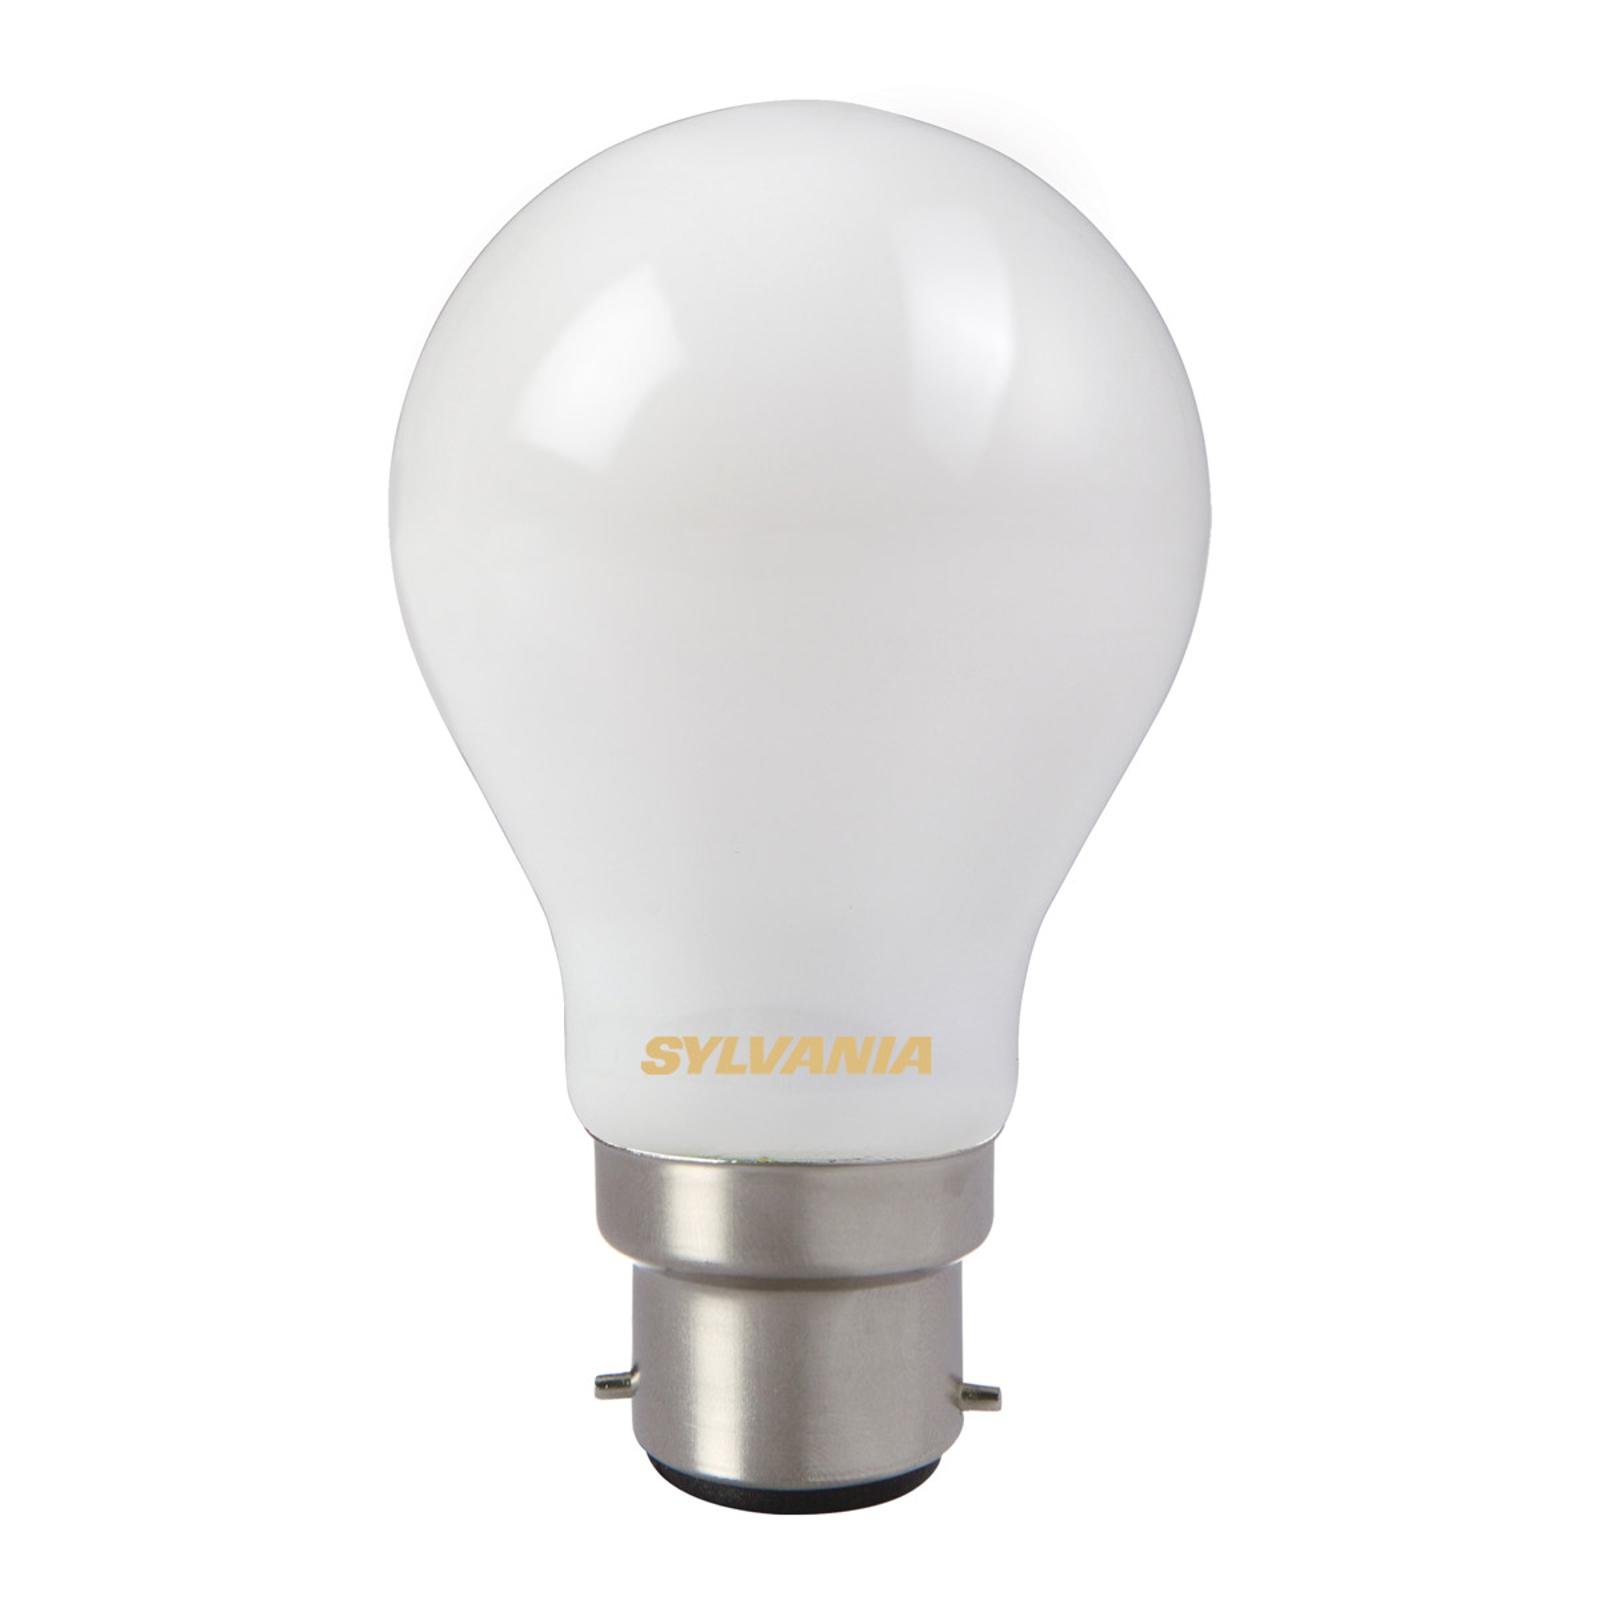 Lampadina LED 827 B22 7W satinata